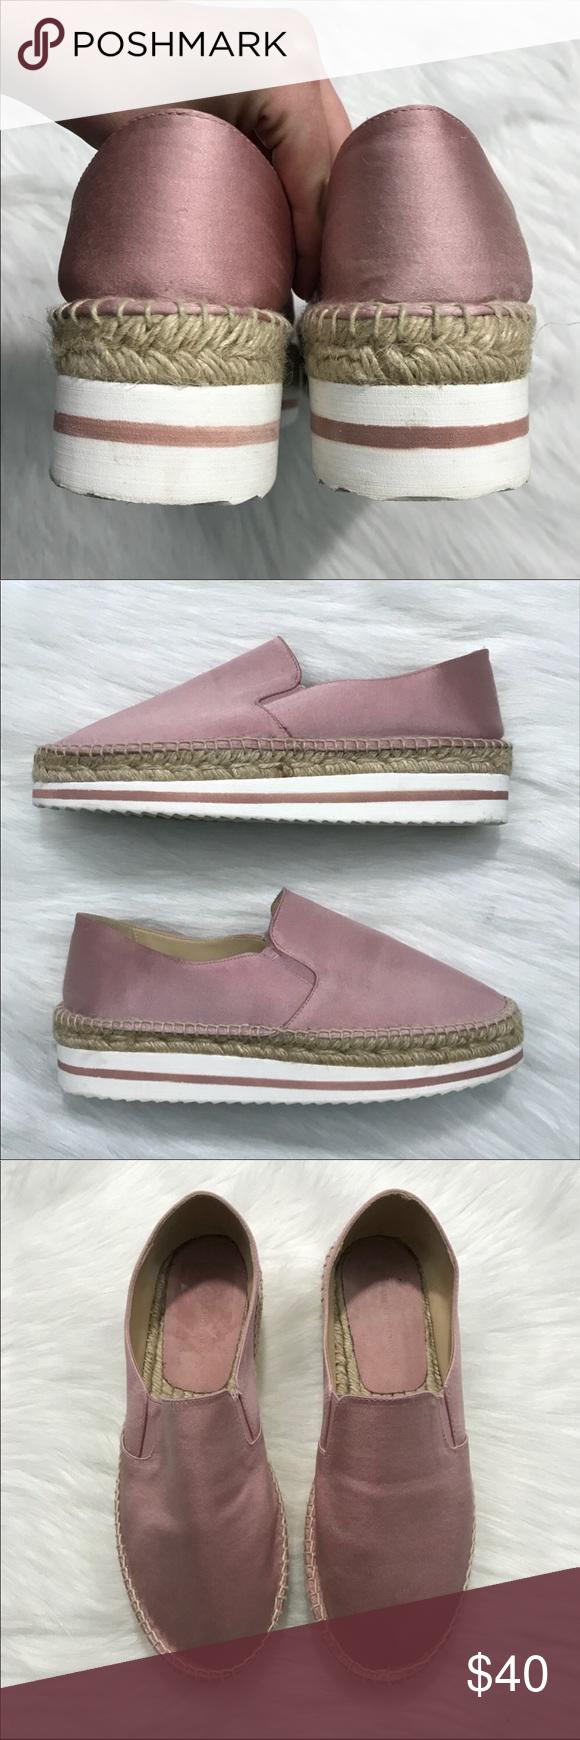 Zara platforms Size